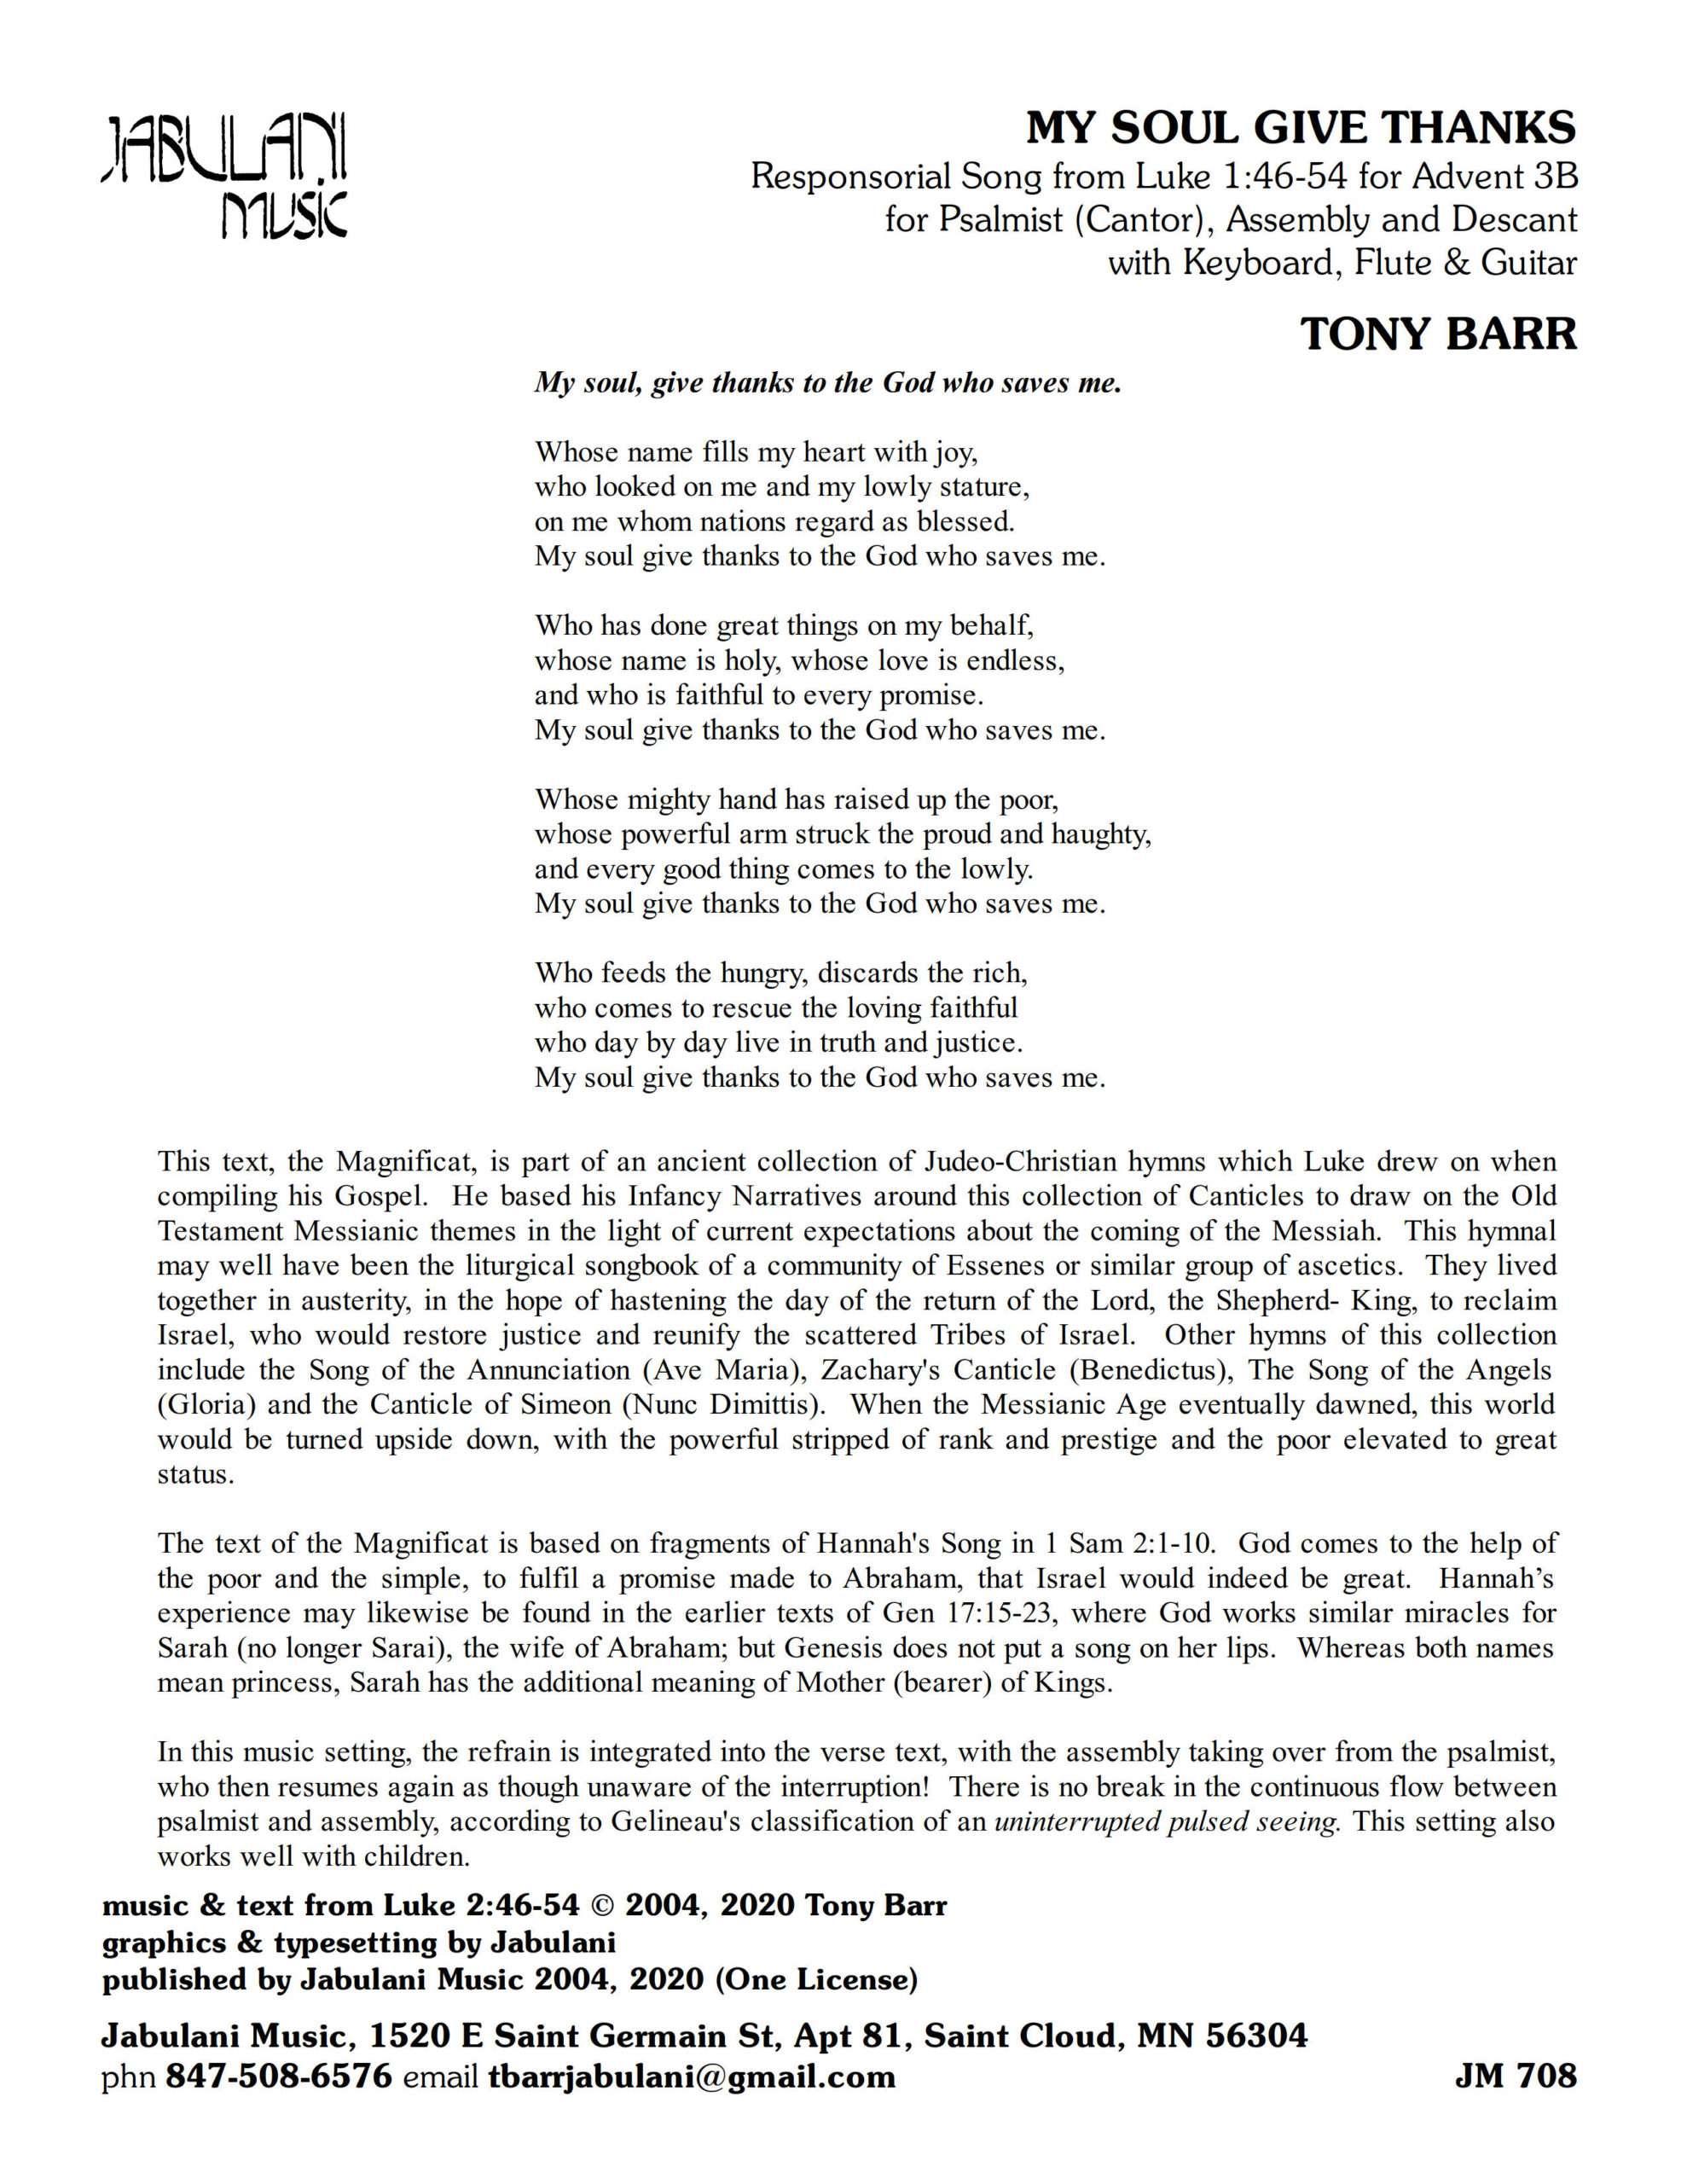 Adv 3B Lk 1 Magnificat My Soul Give Thanks JM 708 Sample Complete PDF 1 png